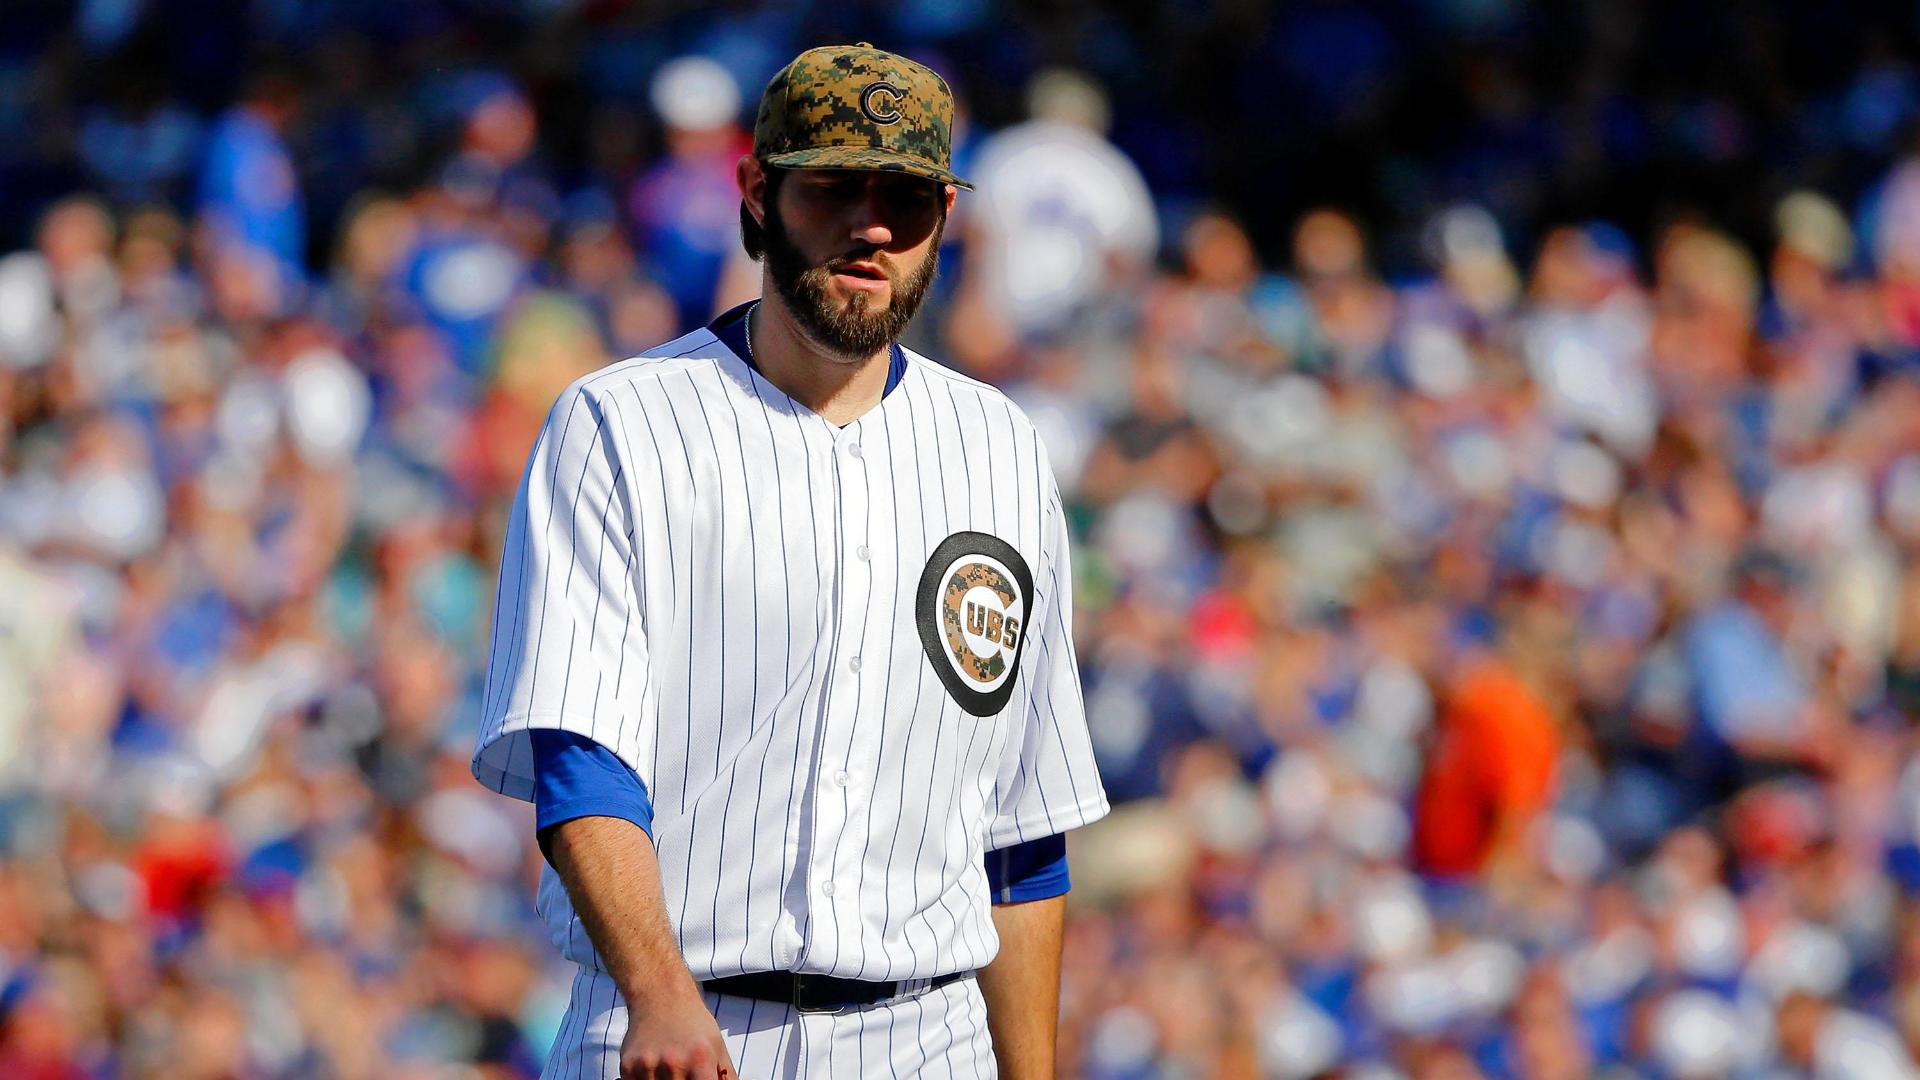 Hammel exits early, Cubs bullpen dominates Dodgers